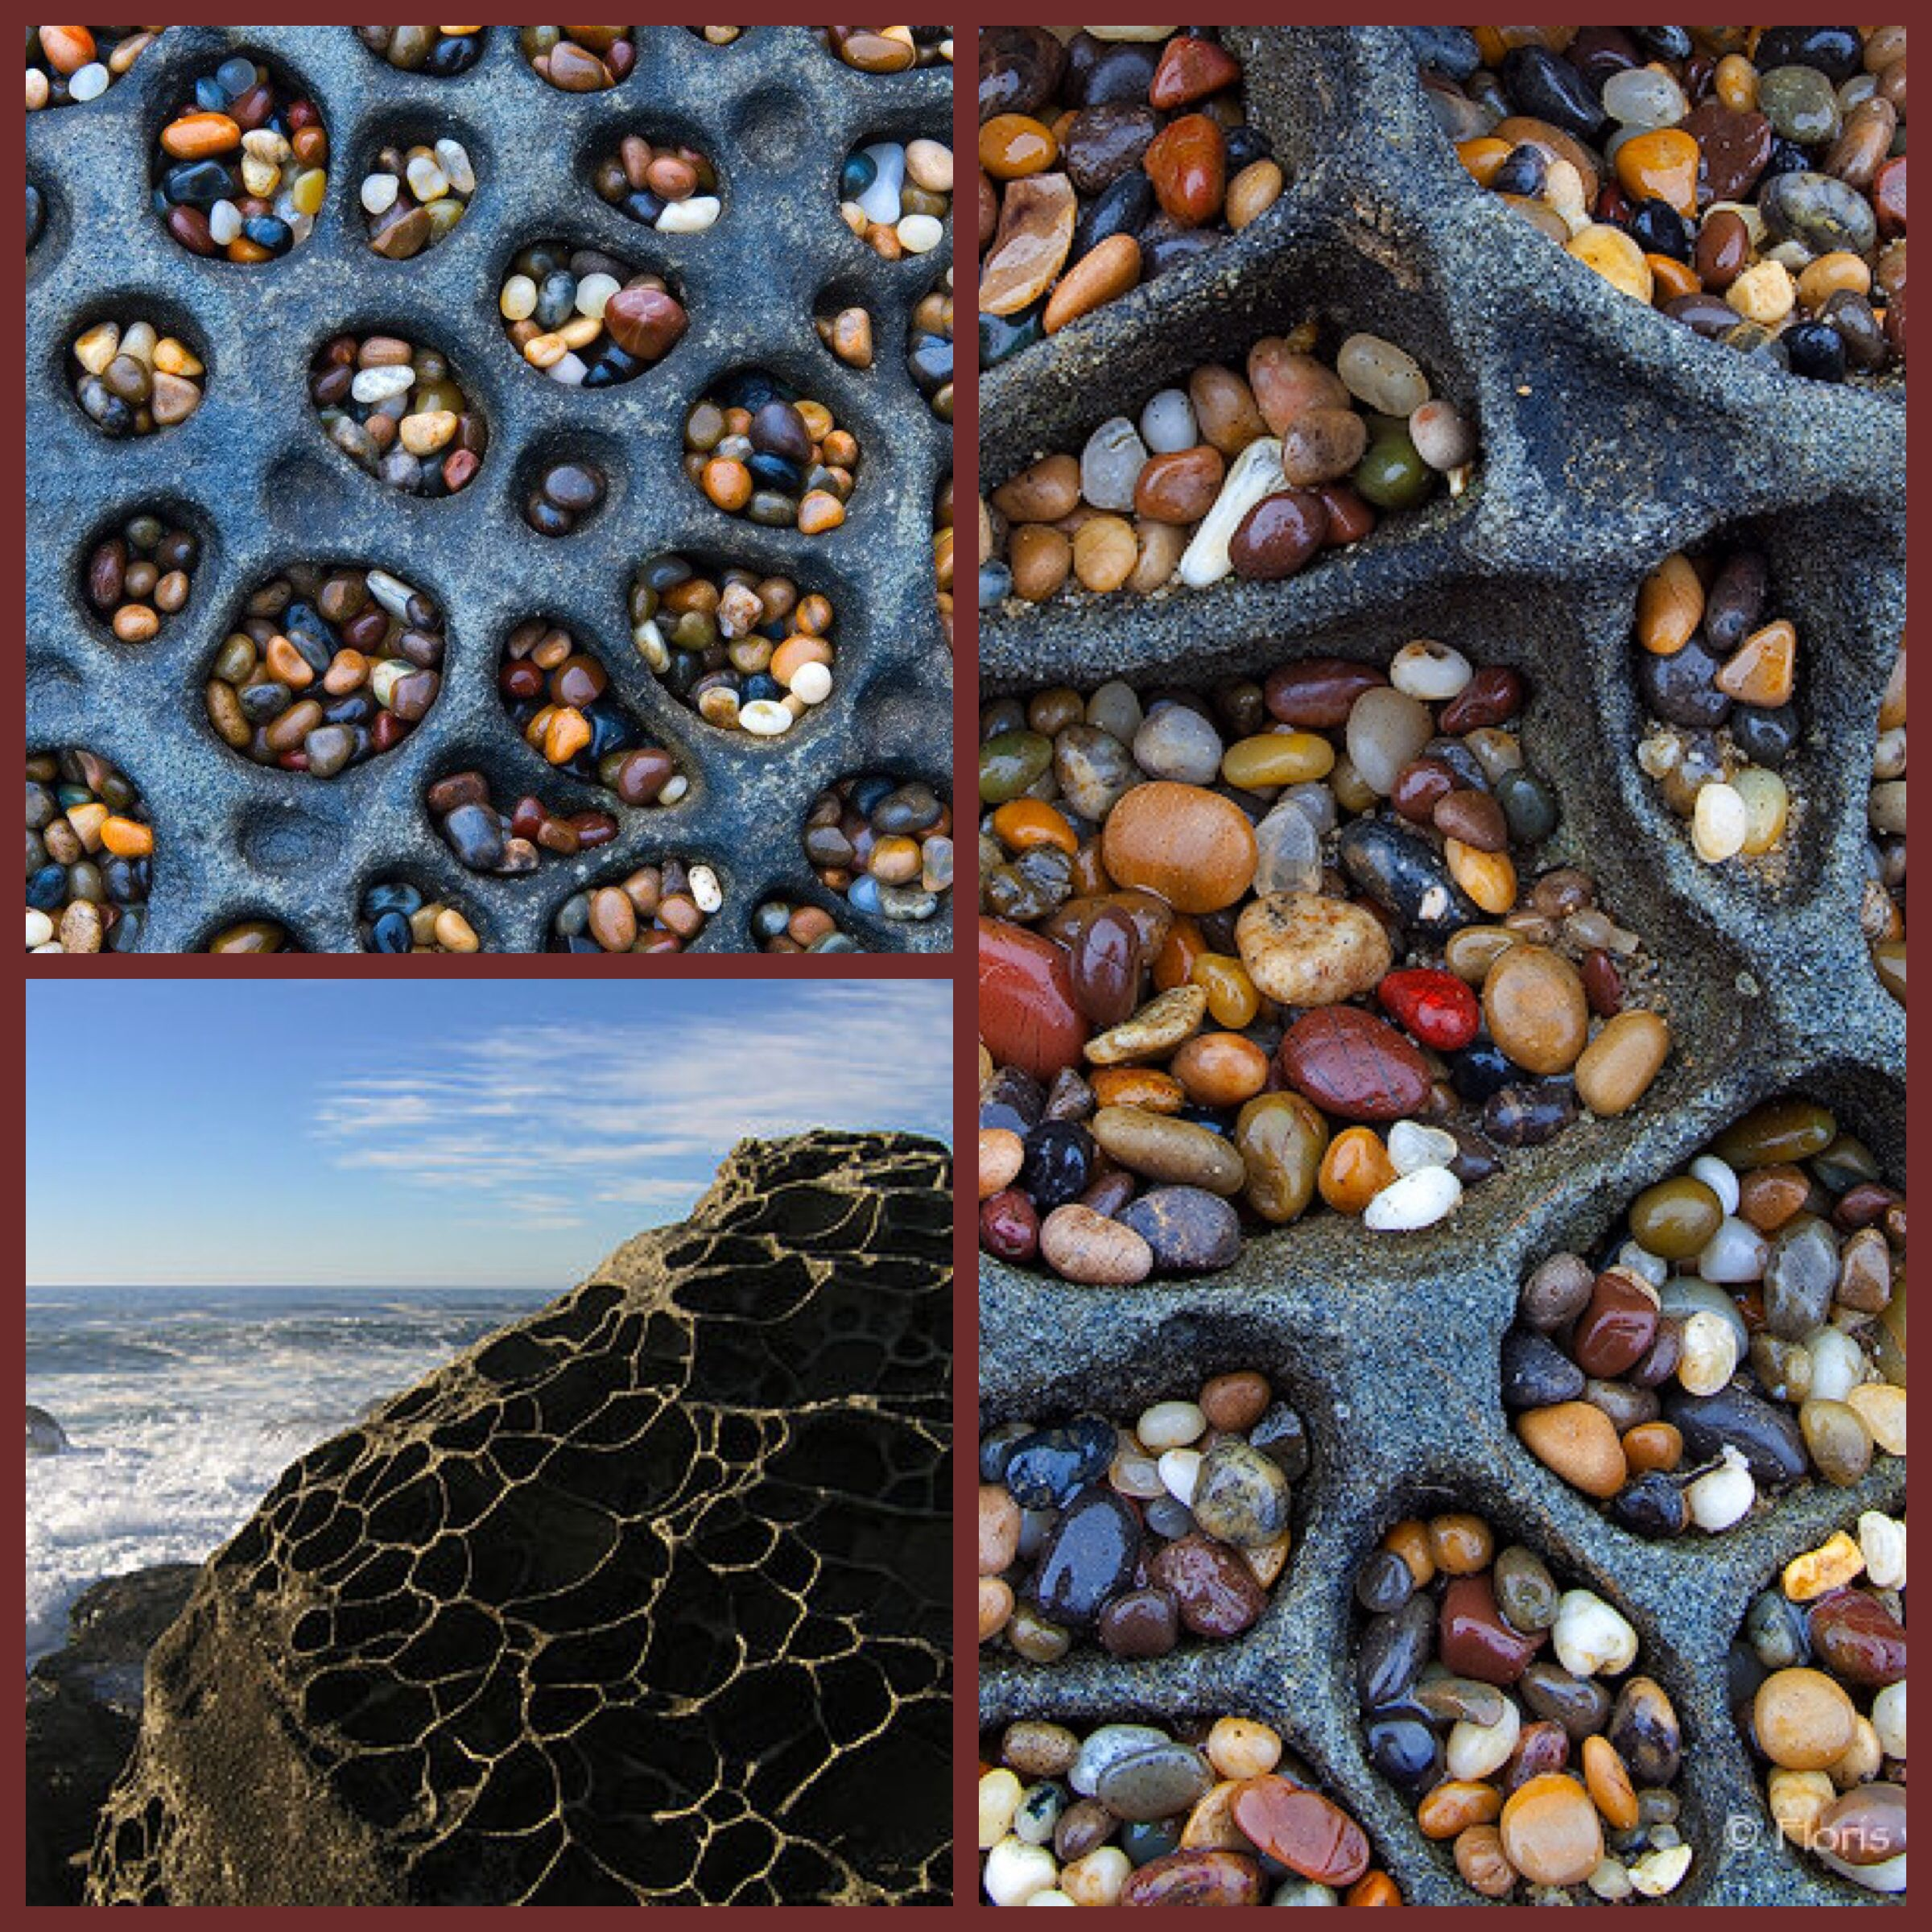 California san mateo county pescadero - Bean Hollow State Beach Is A Beach Located In San Mateo County Near Pescadero Ca